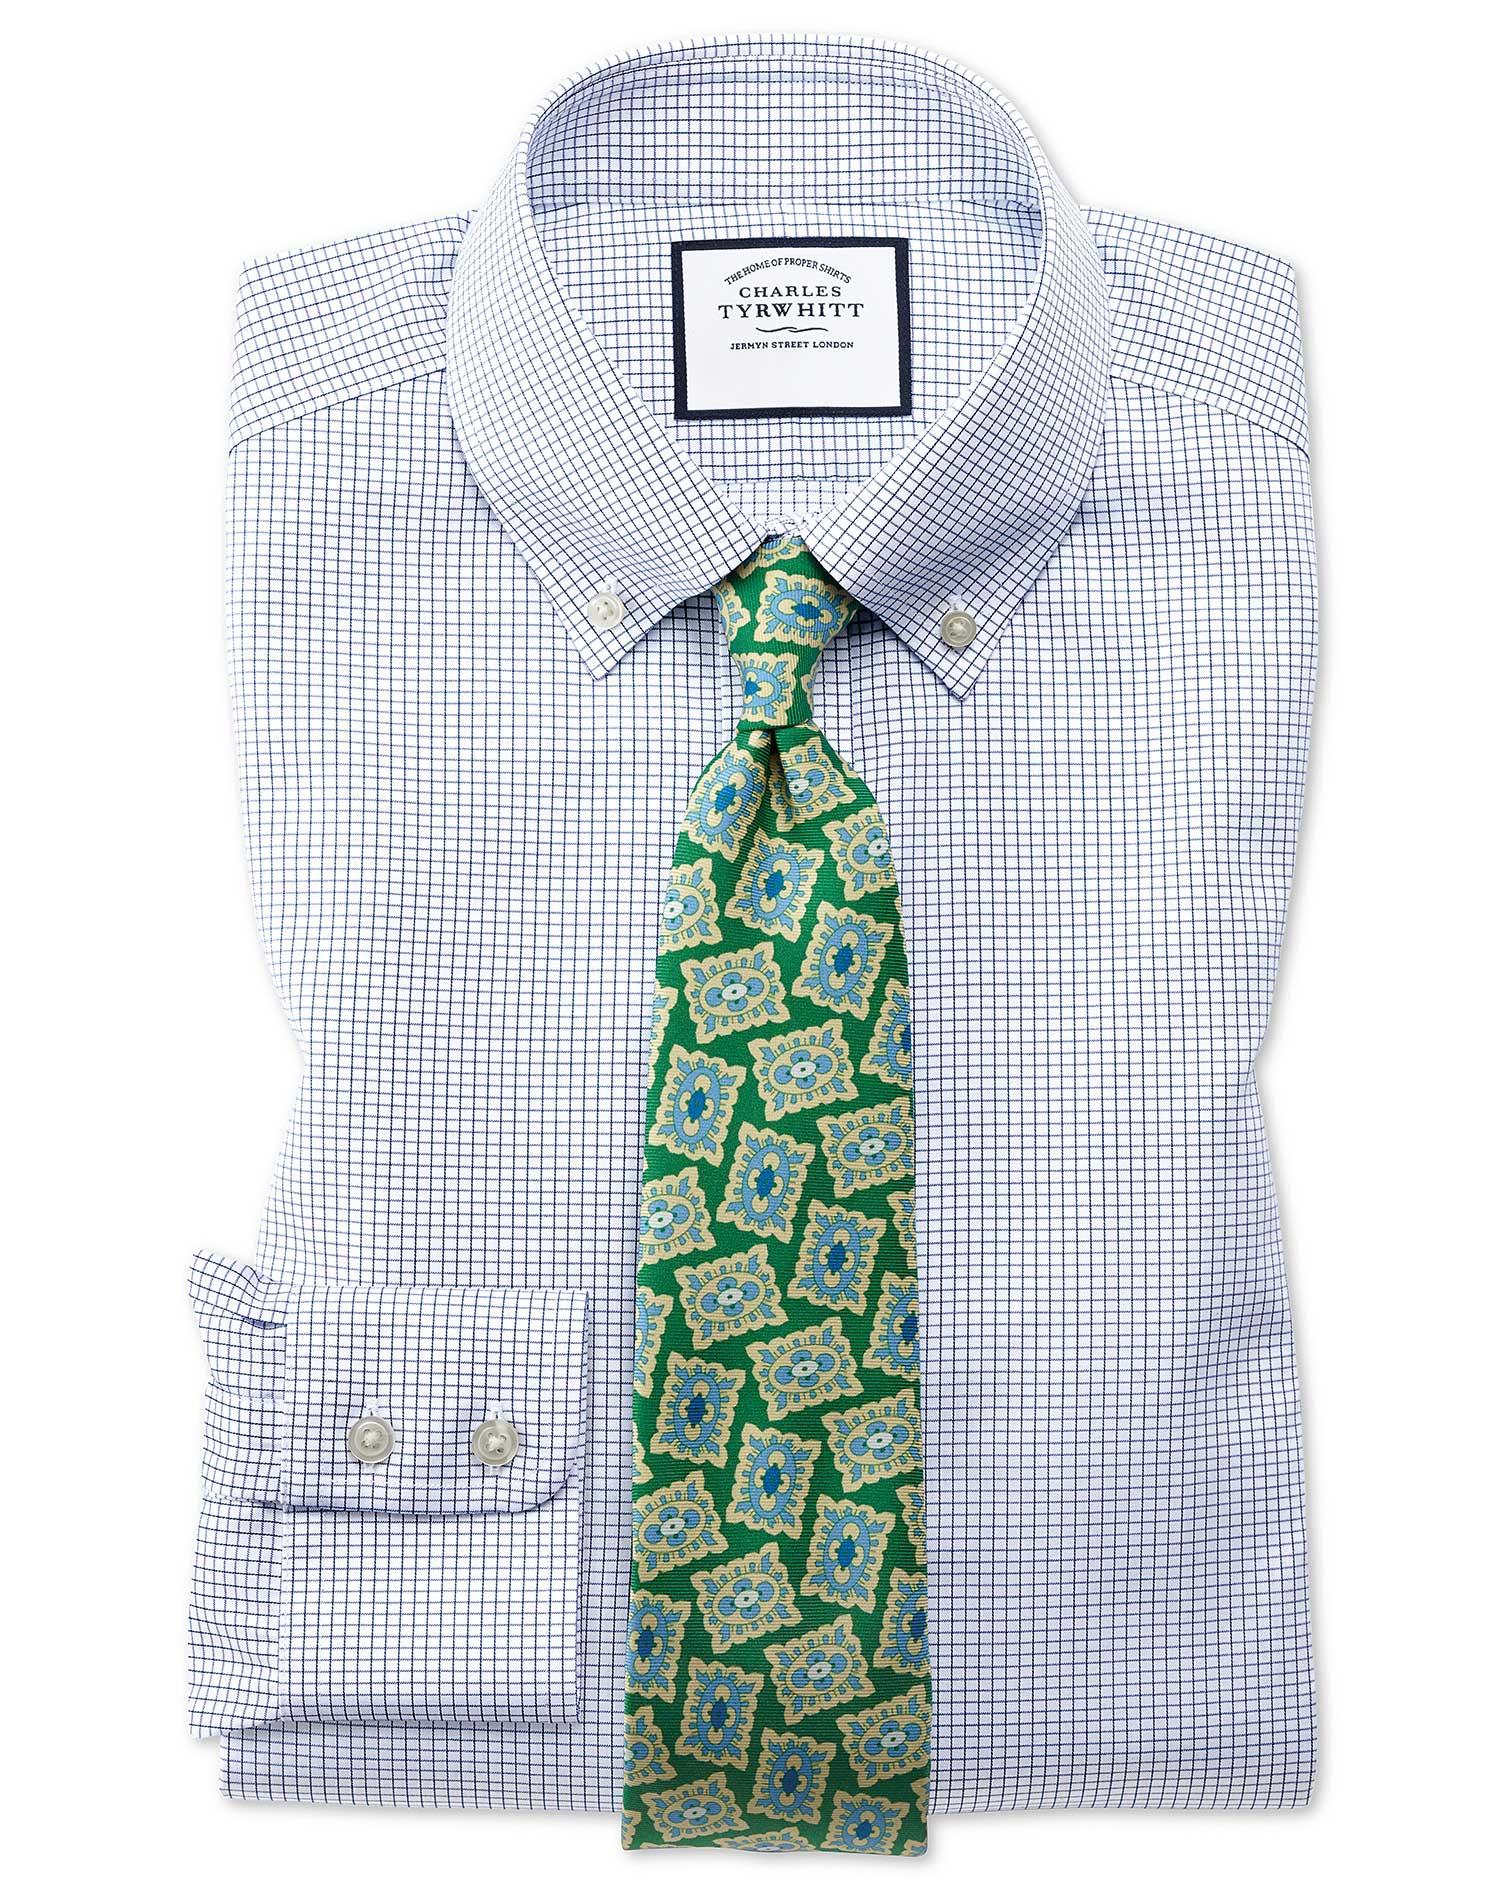 Classic Fit Button-Down Non-Iron Twill Mini Grid Check Navy Blue Cotton Formal Shirt Single Cuff Siz